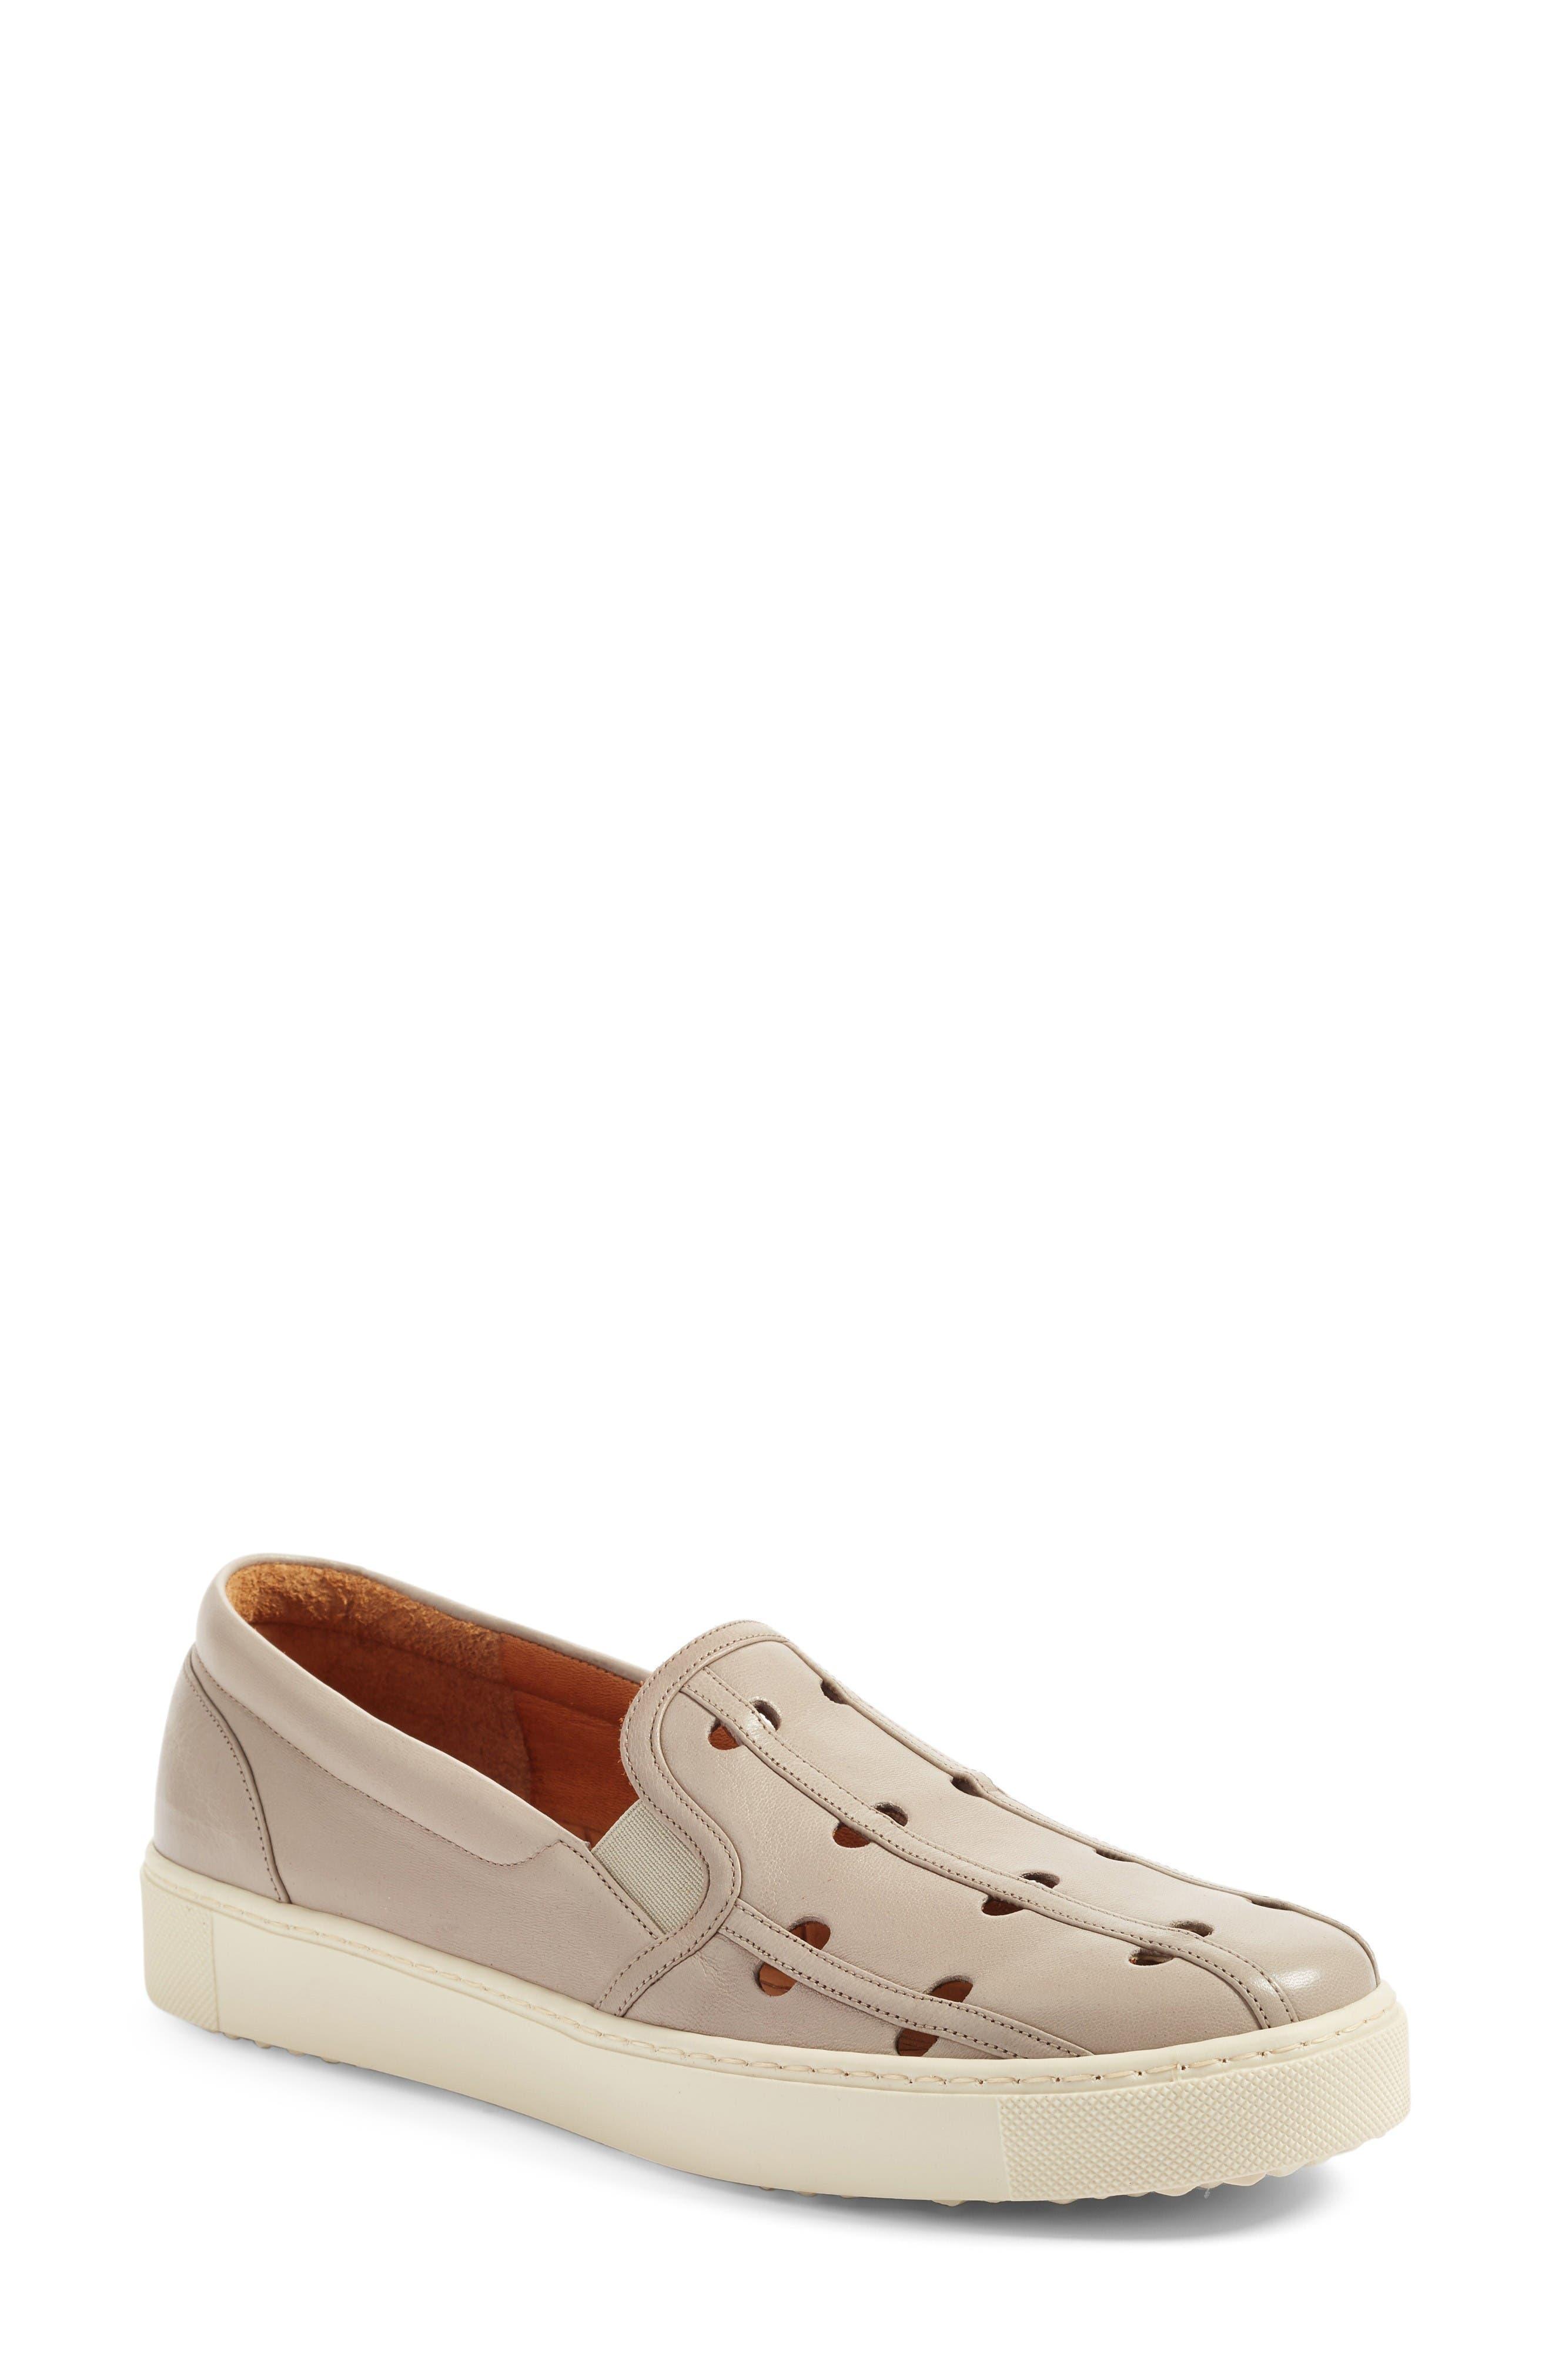 CHIE MIHARA Zanca Slip-On Sneaker